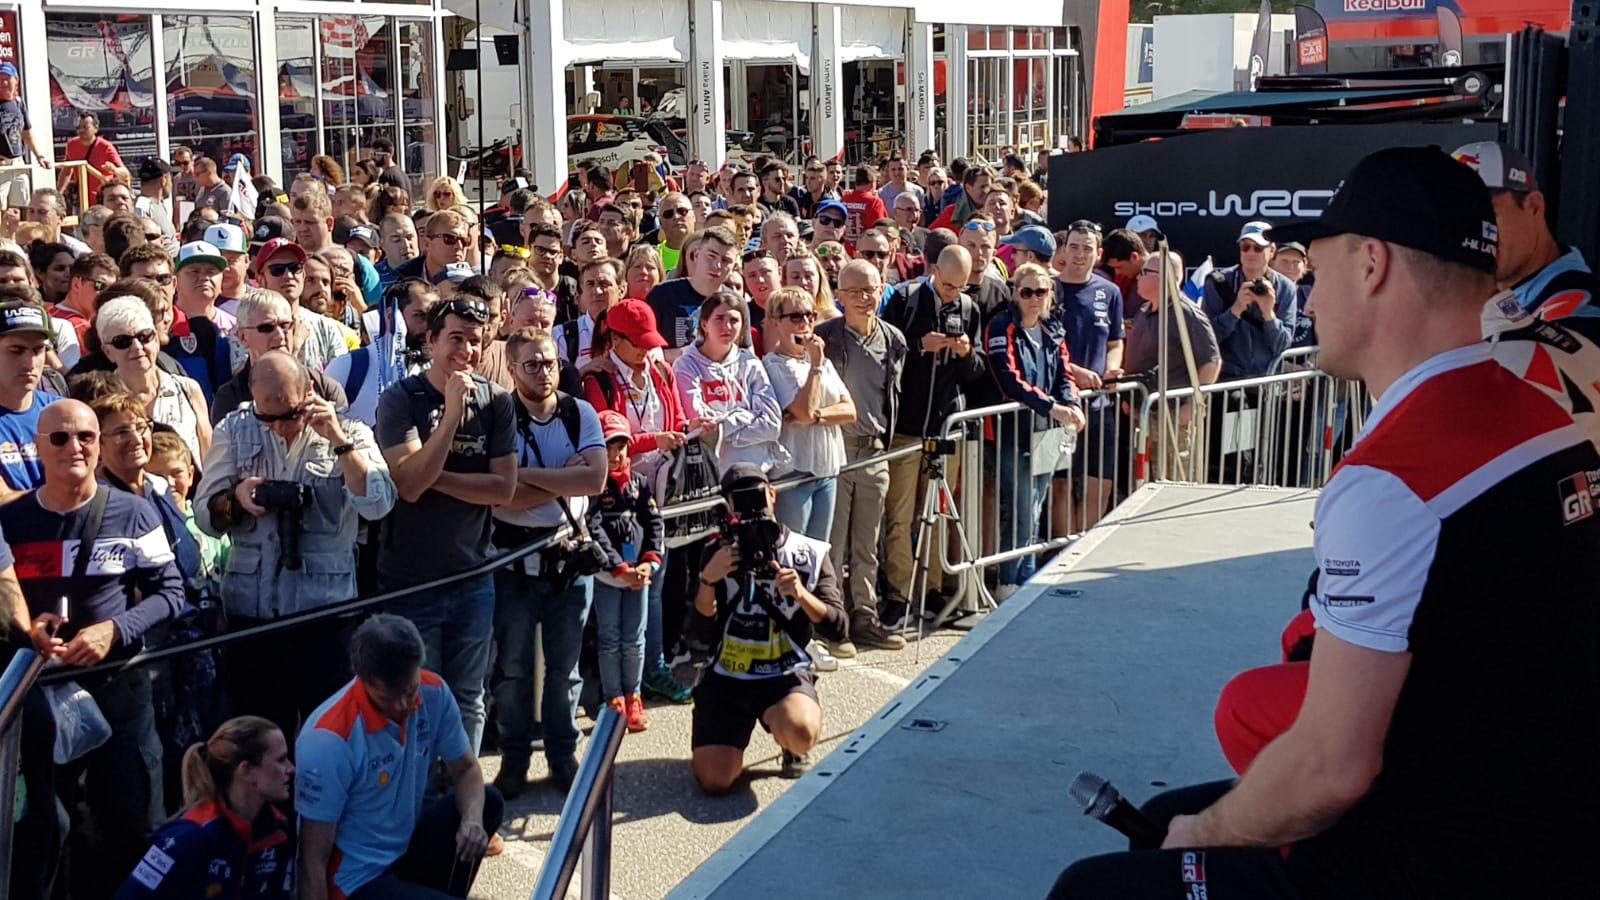 WRC: 55º RallyRACC Catalunya - Costa Daurada - Rally de España [24-27 Octubre] - Página 5 EHo-RaeXkAAViSW?format=jpg&name=large